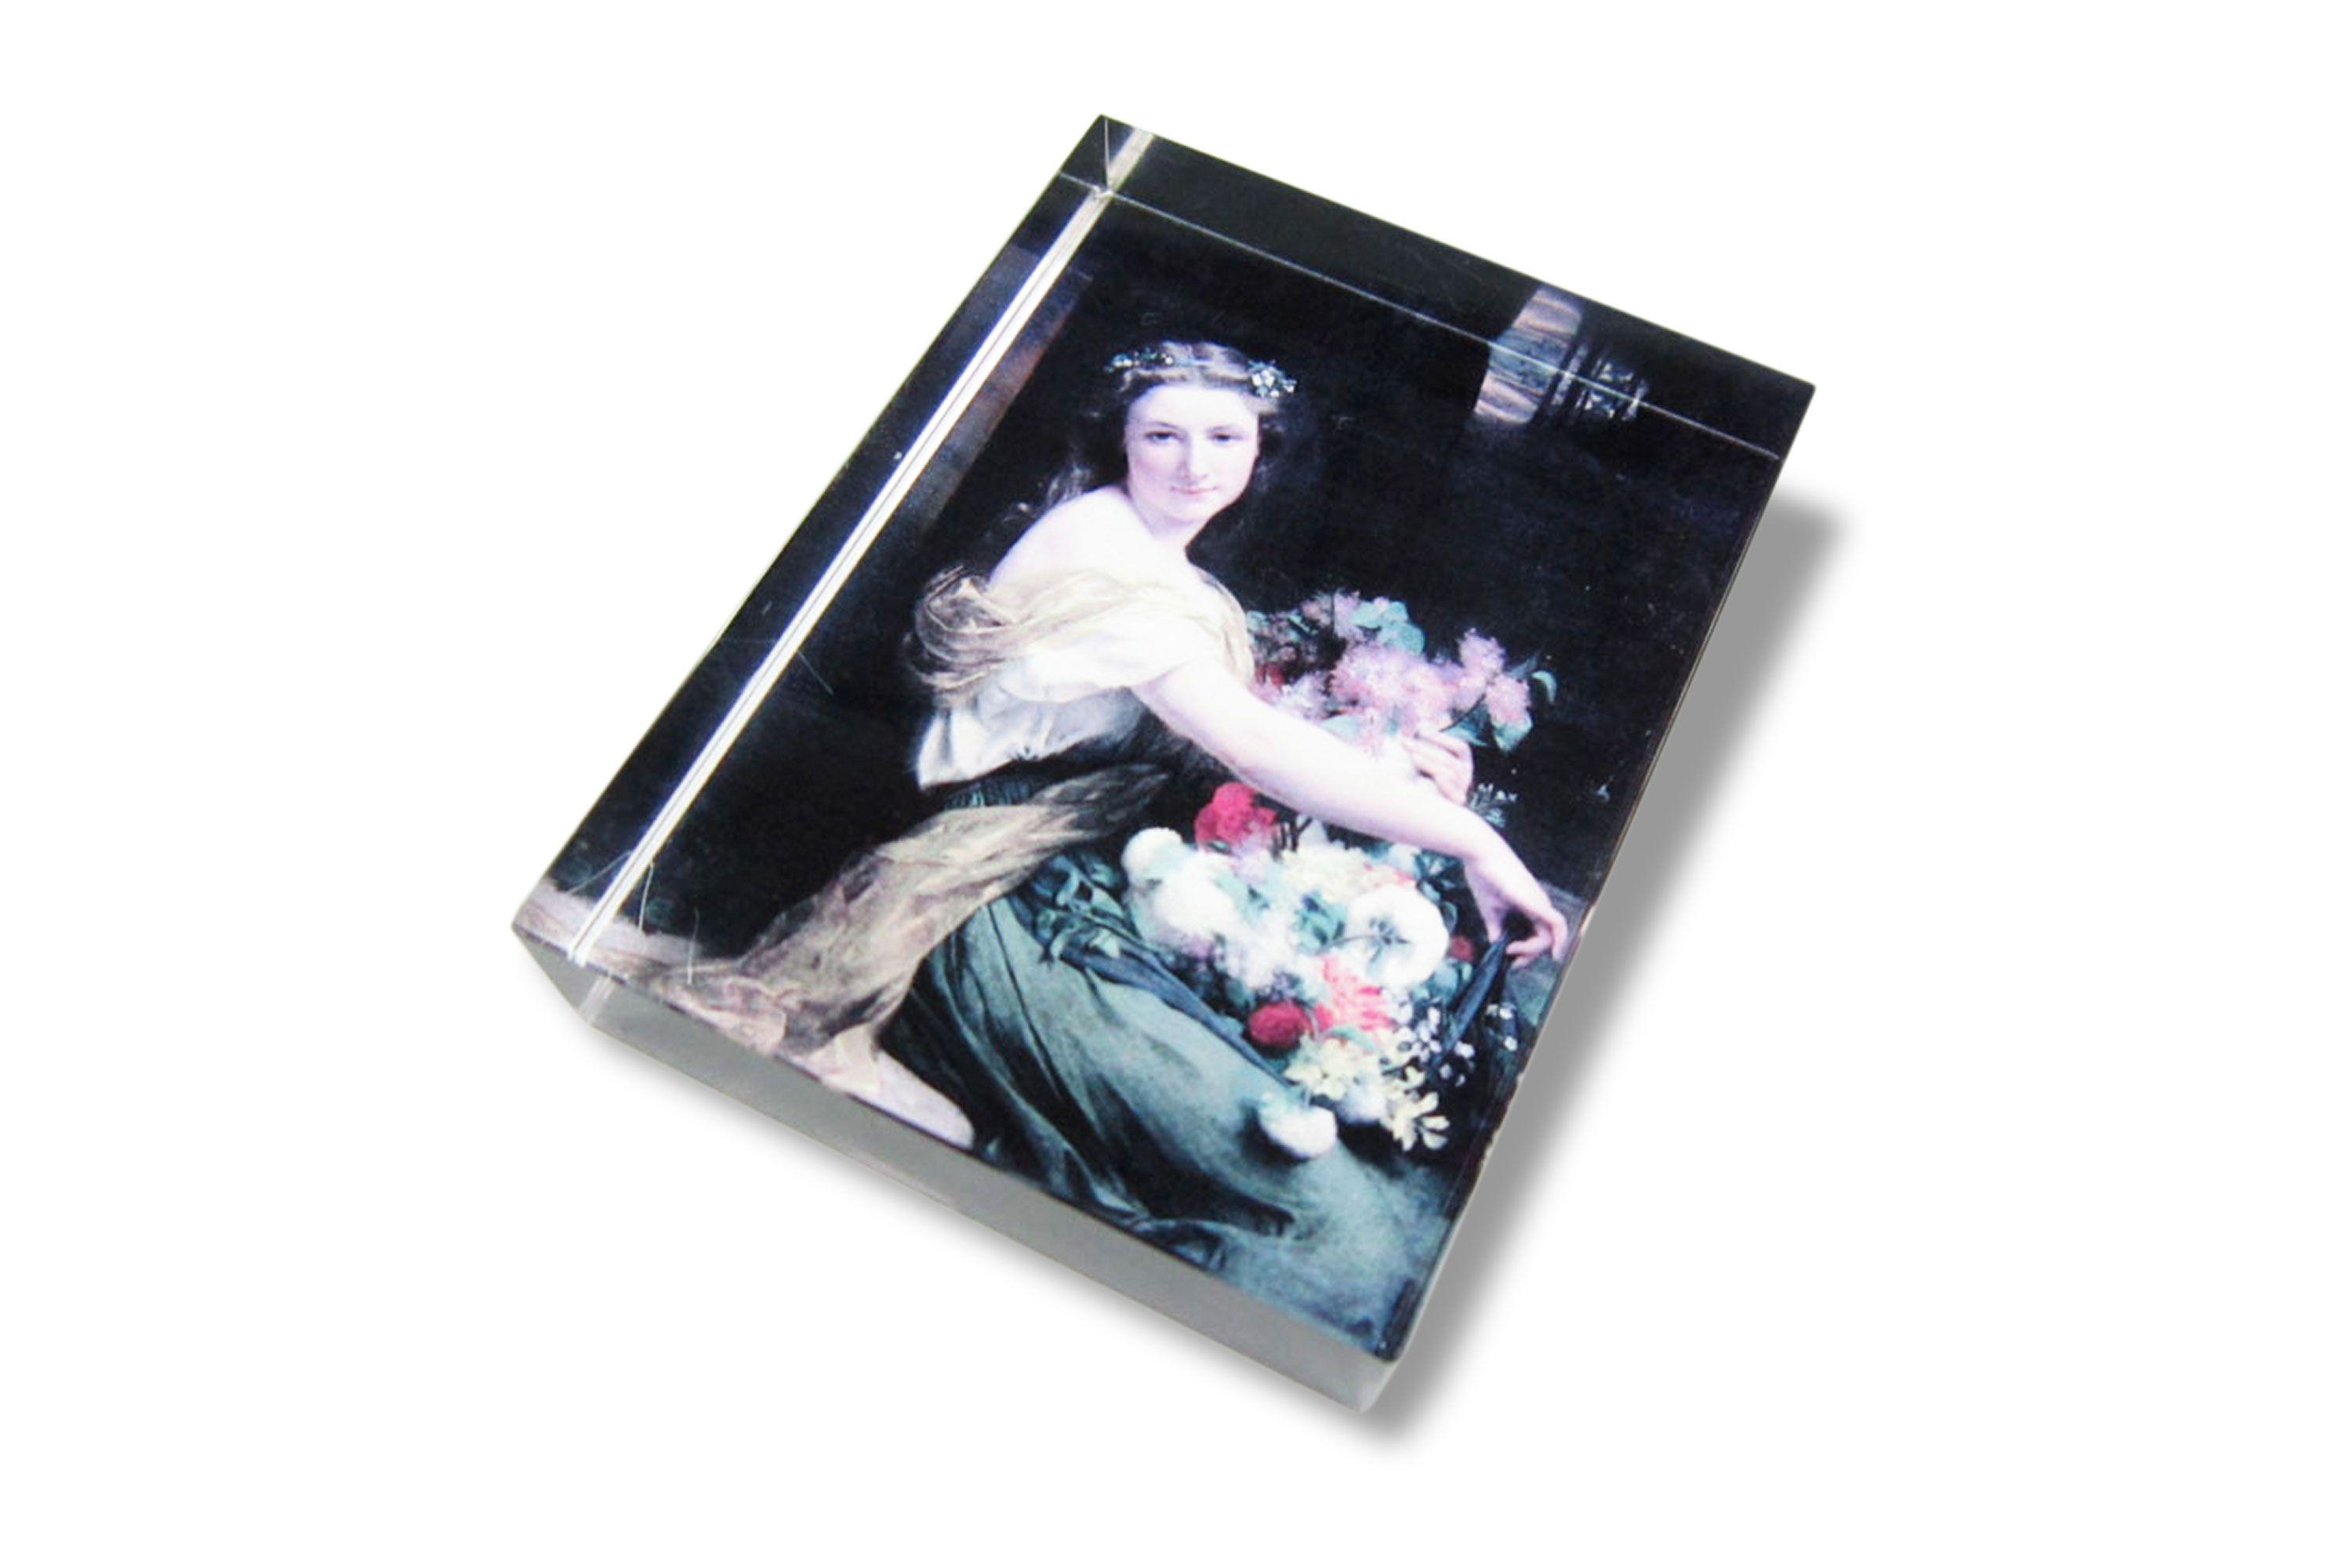 Artwork print on crystal frame artwork prints canvas